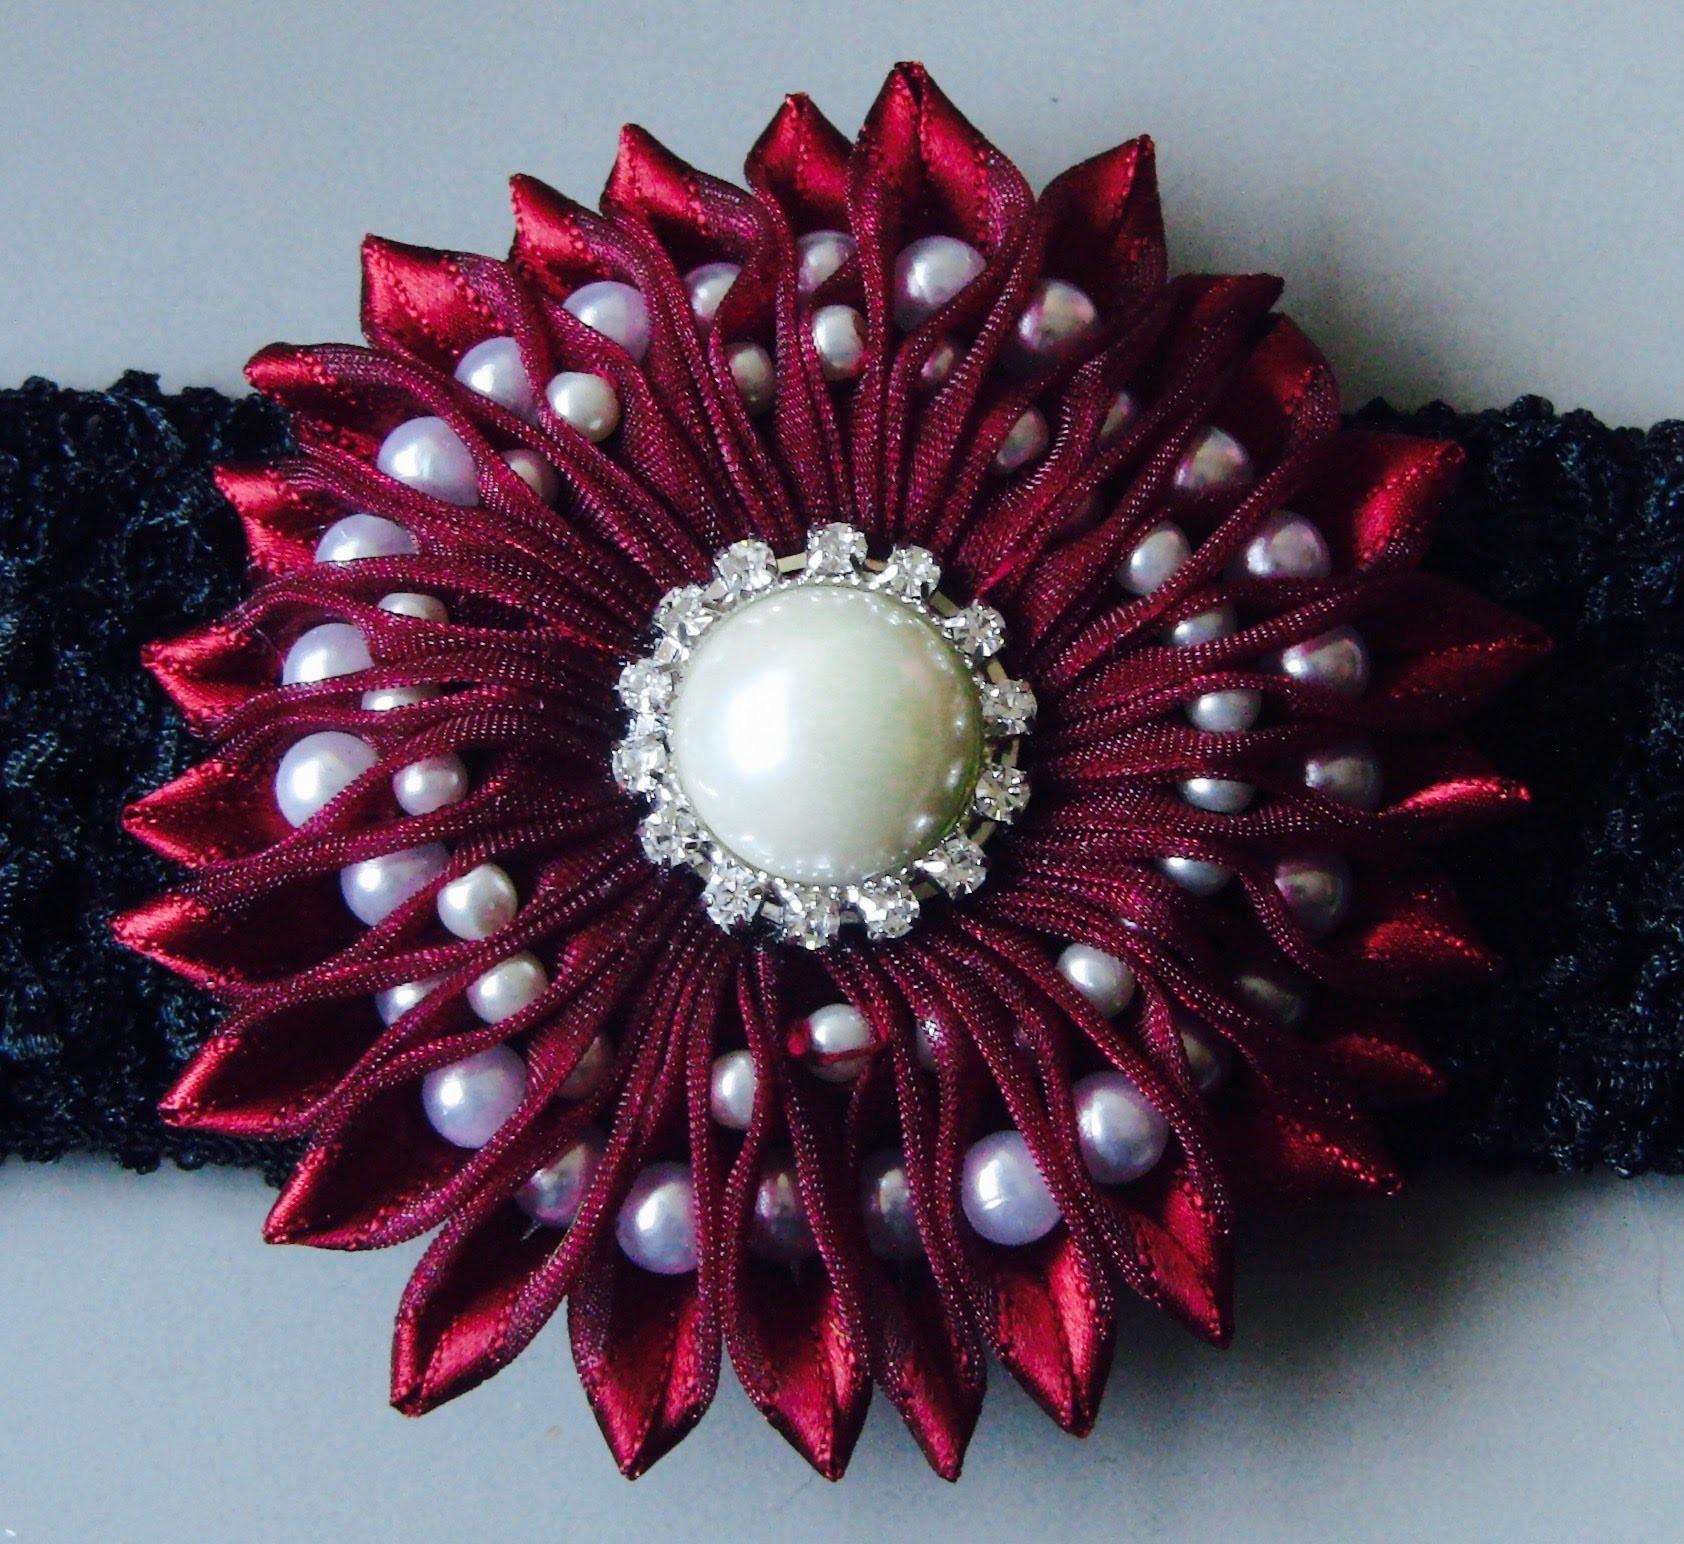 Ribbon flower with beads - grosgrain flowers